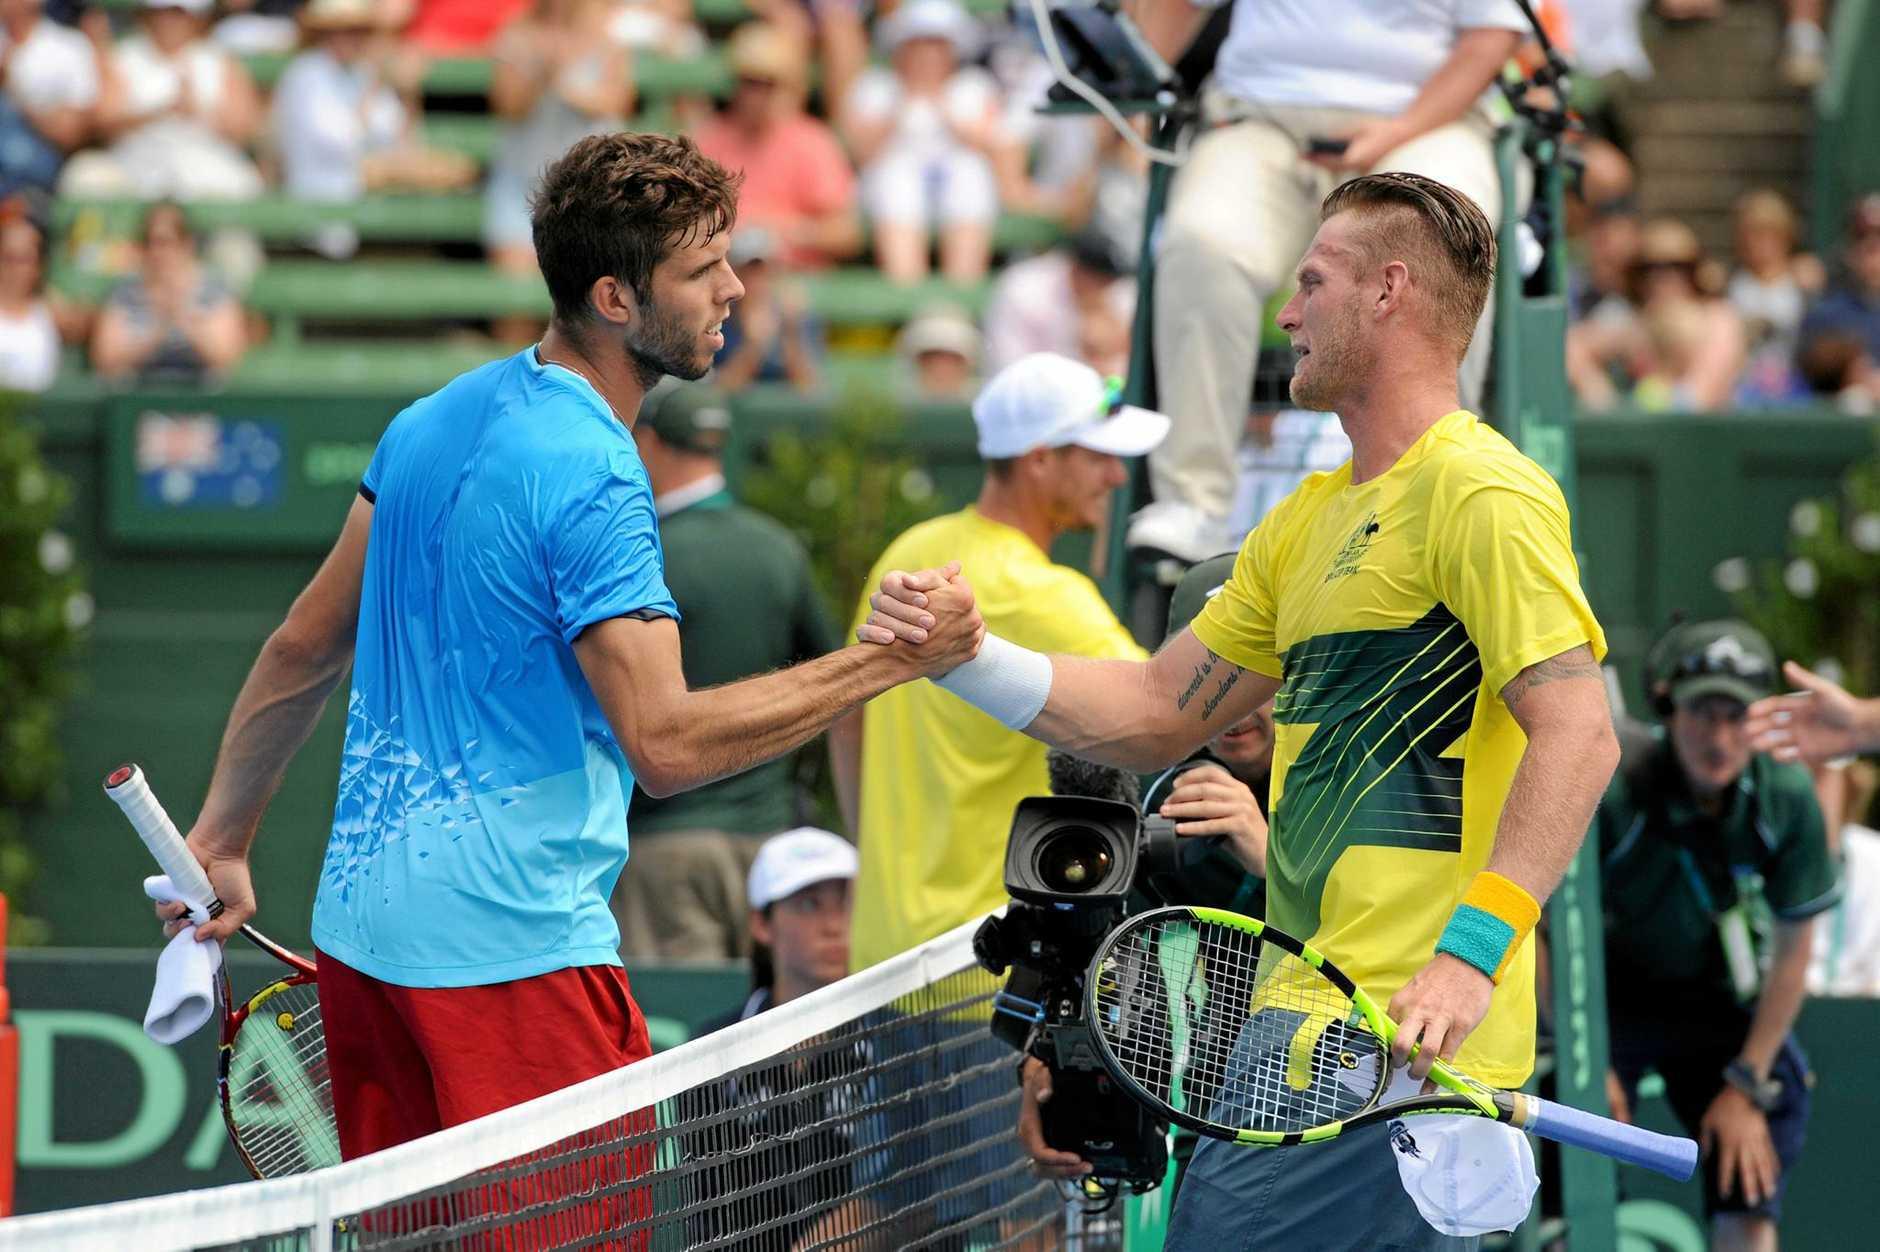 Jiri Vesely of the Czech Republic celebrates his win over Sam Groth of Australia in the Davis Cup.